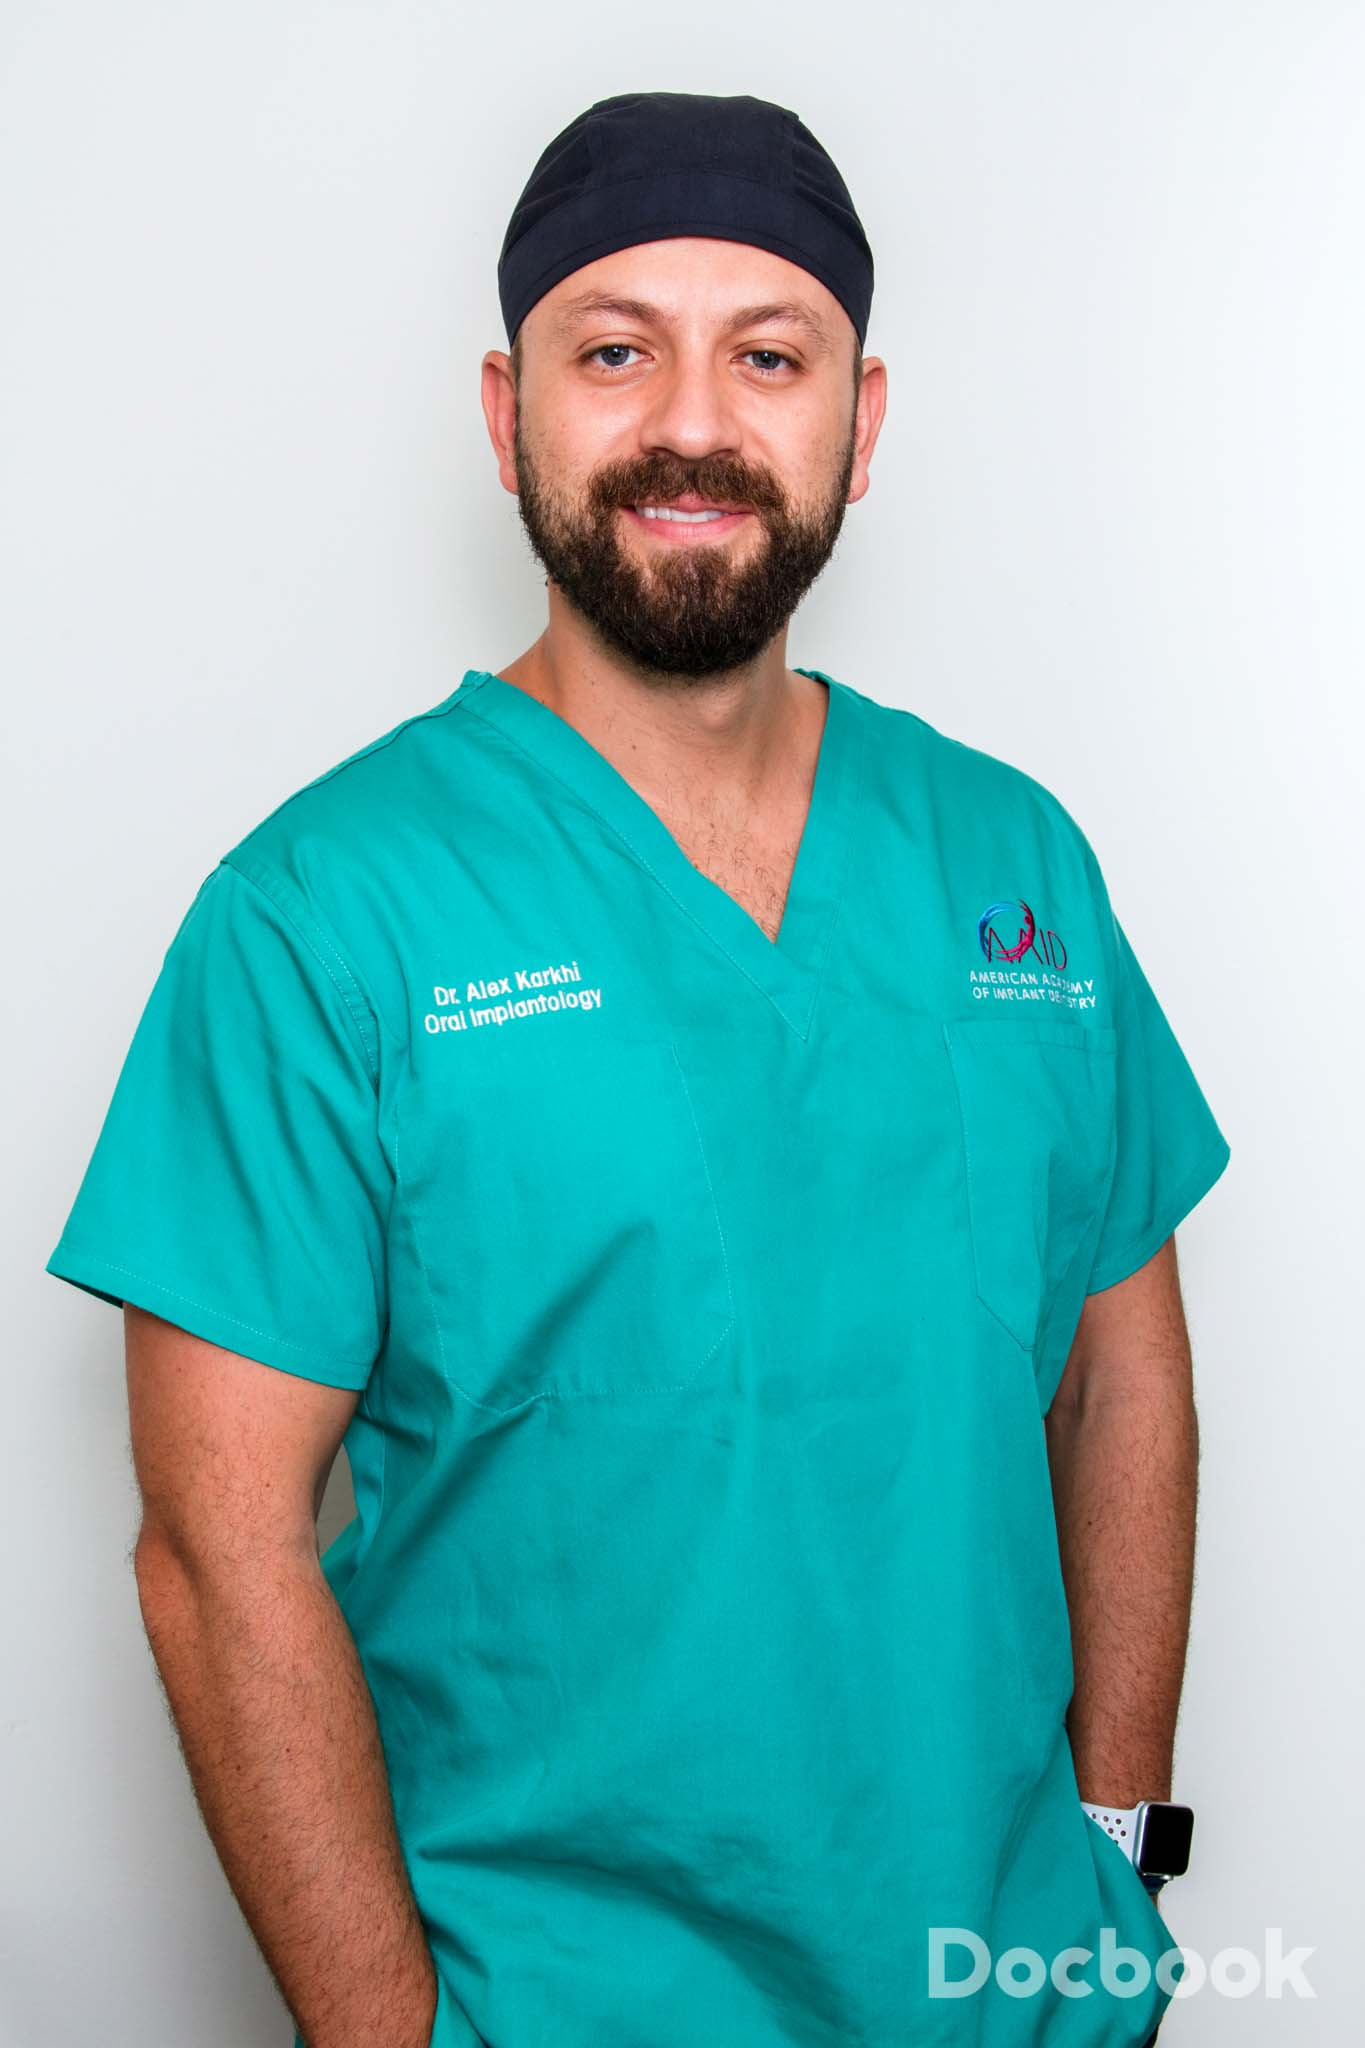 Dr. Alex Karkhi